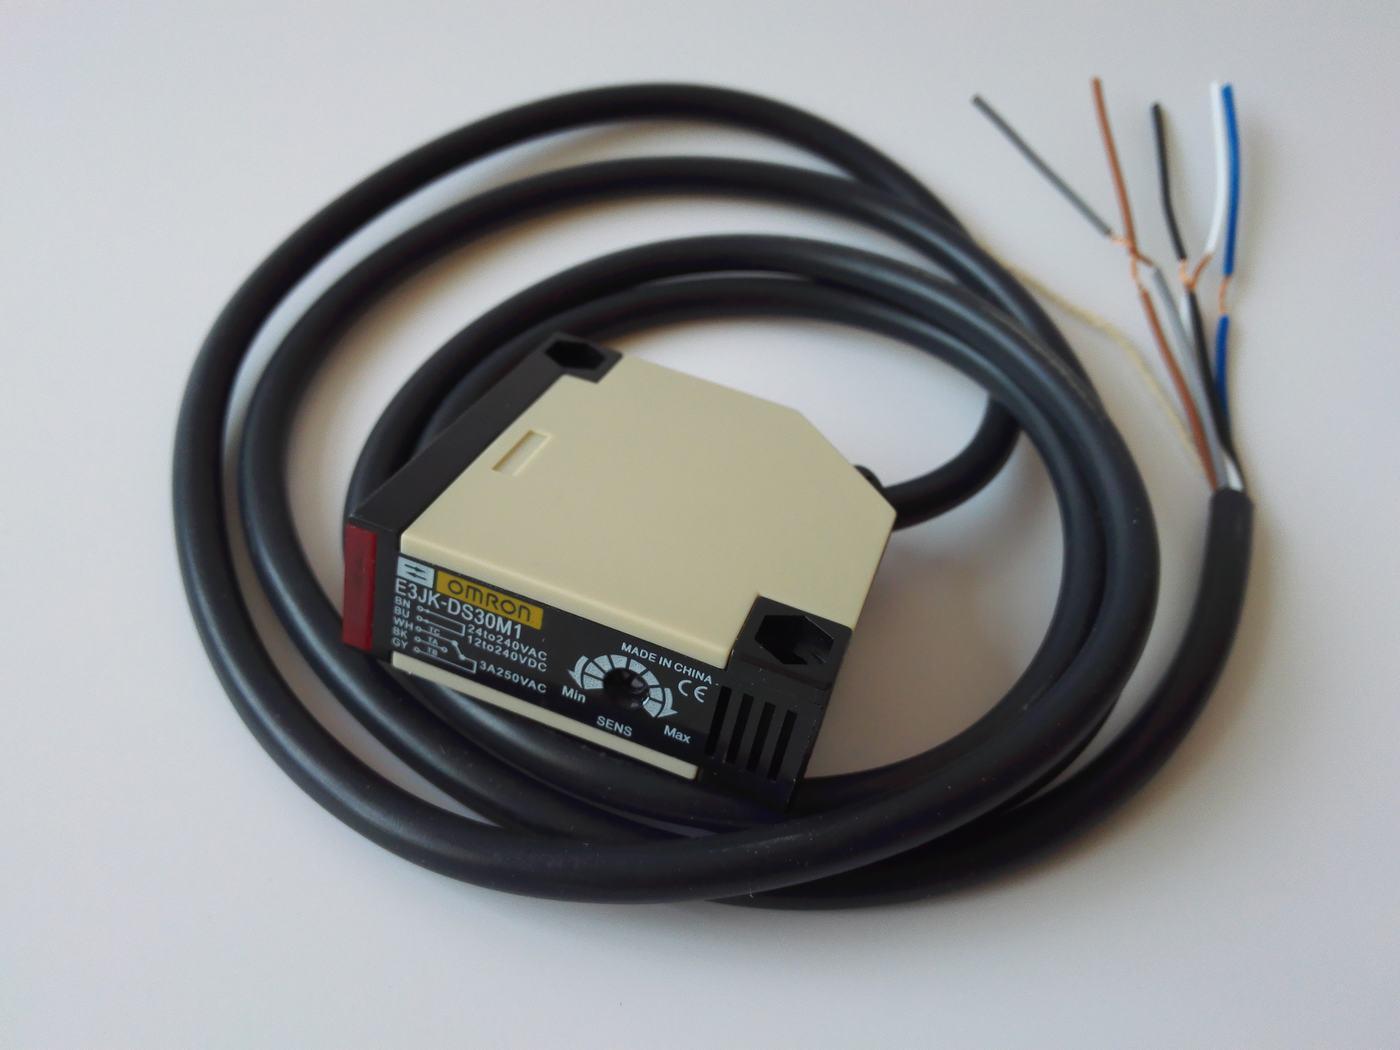 China Output Photoelectric Sensor E3jk Ds30m1 Dc24v No Nc Relay Switch Diffuse Type